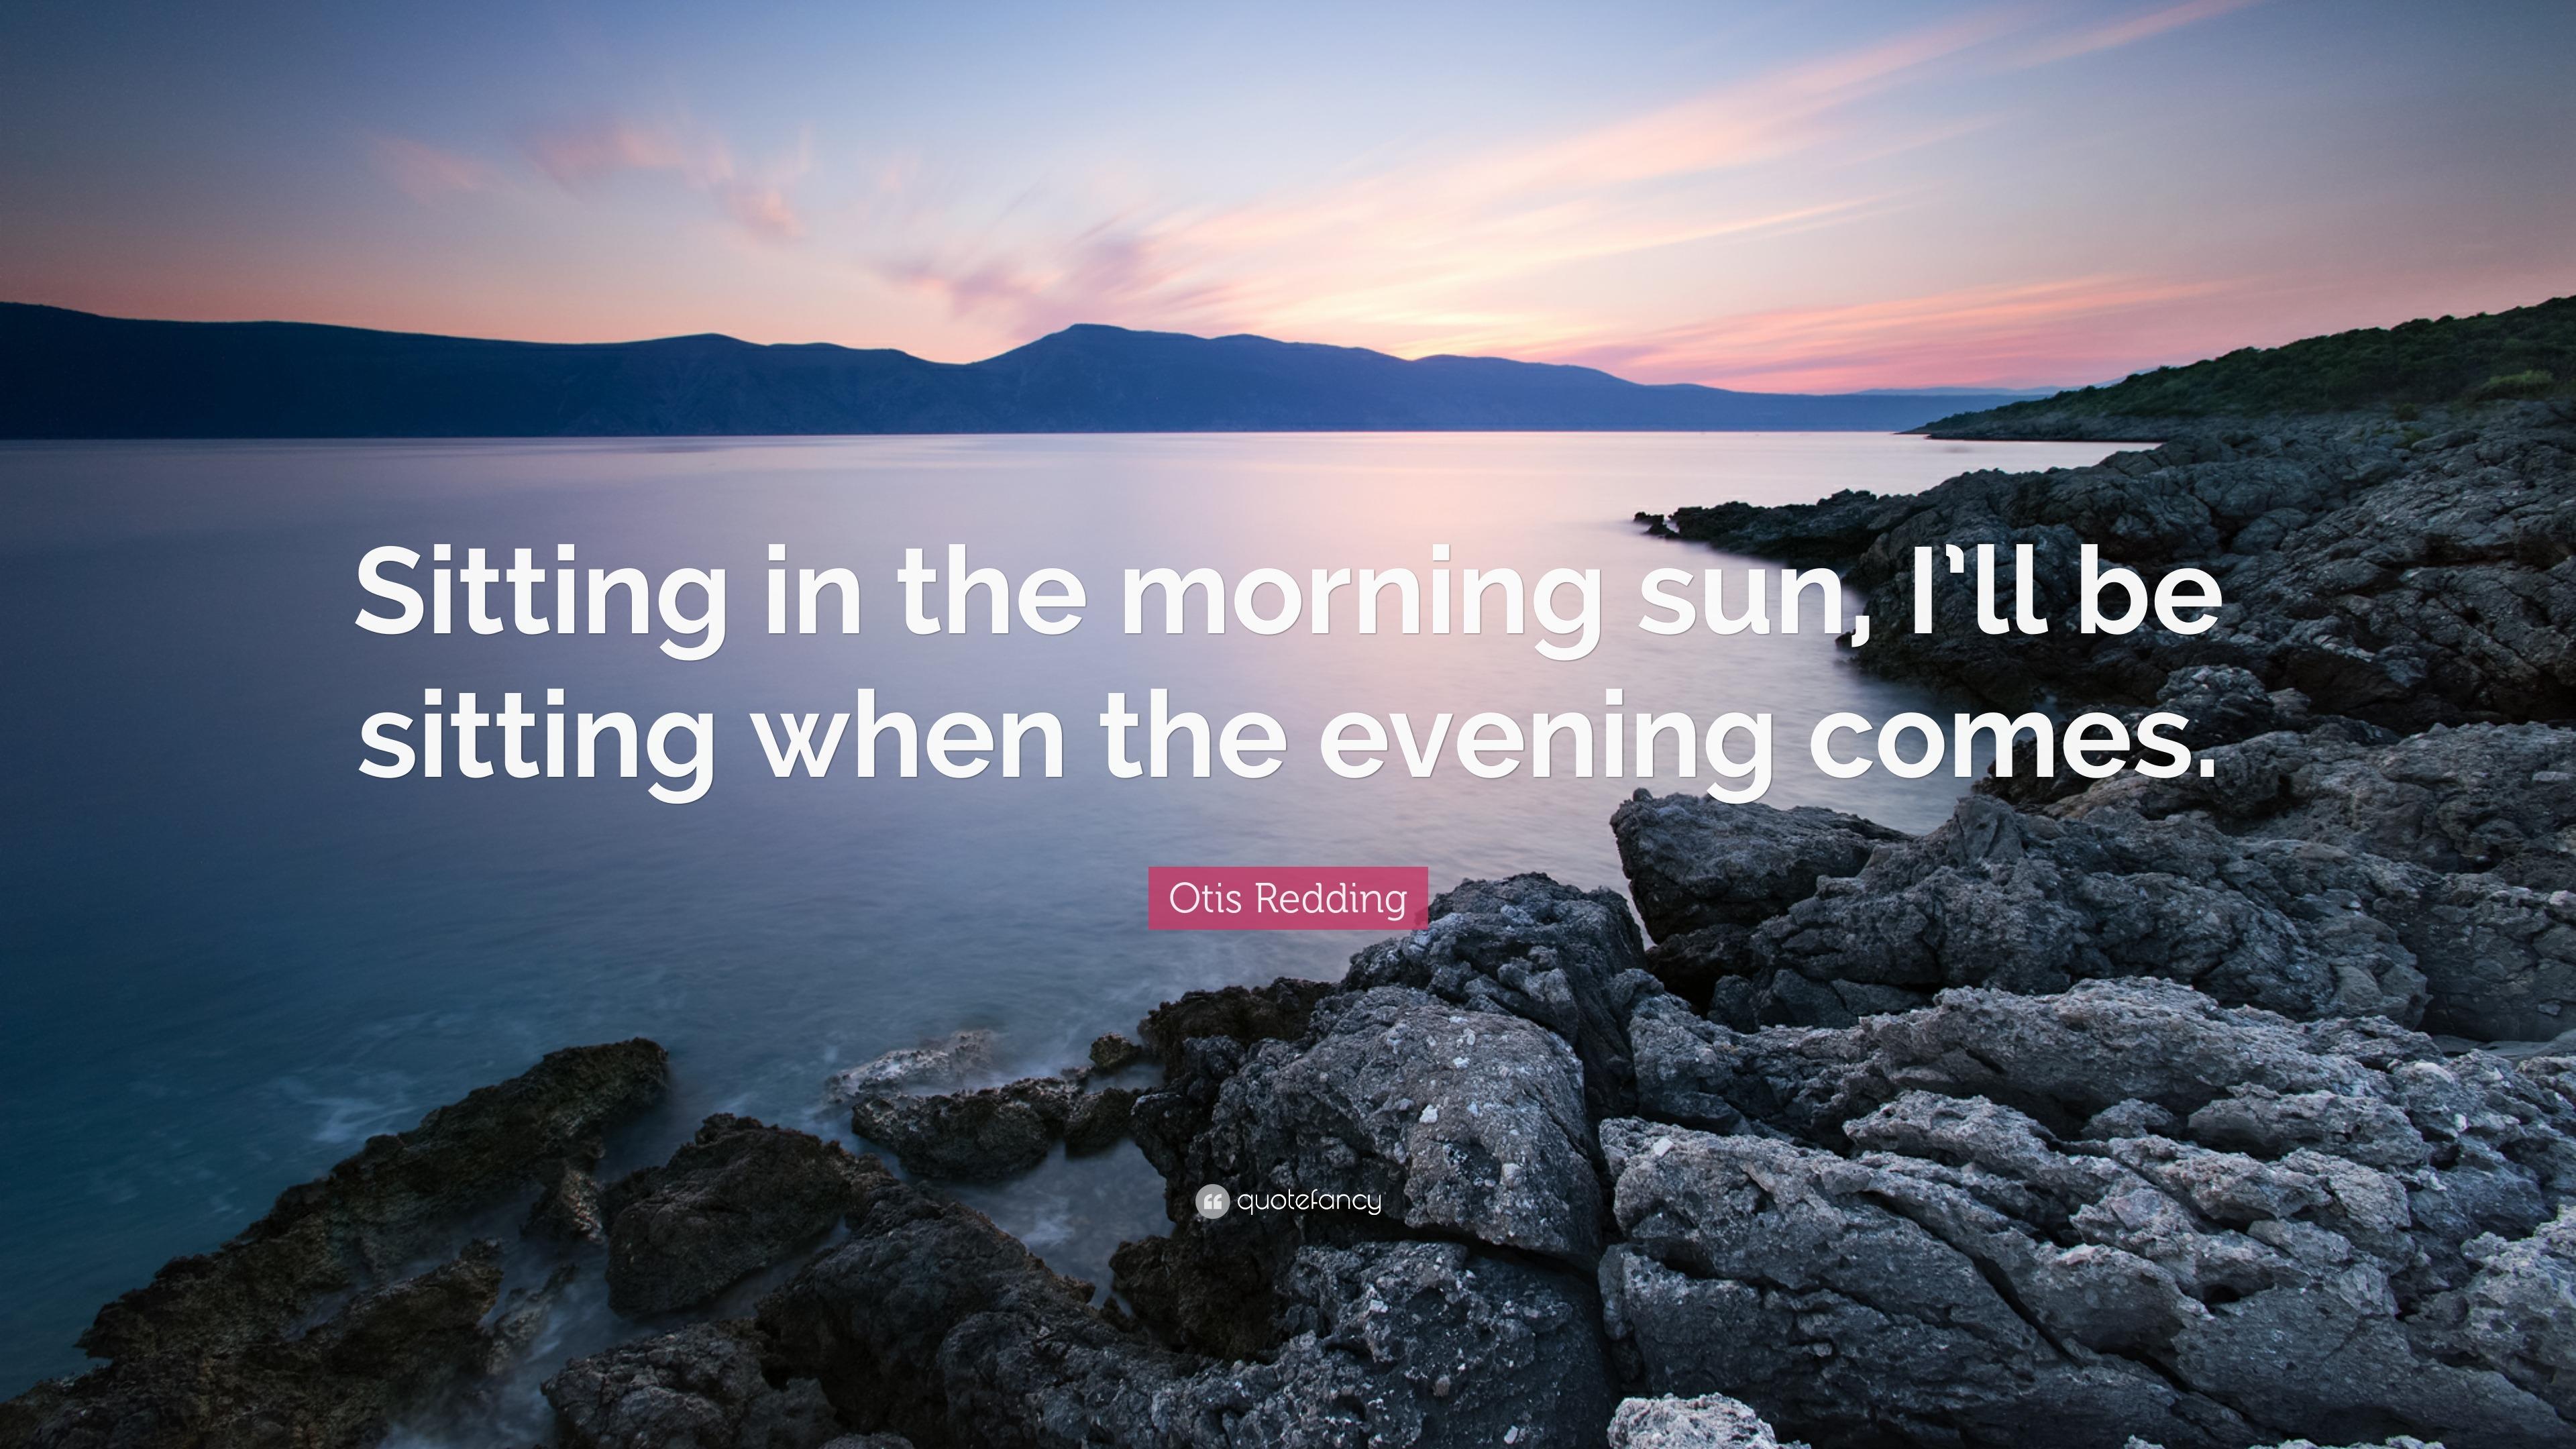 Otis Redding Quote Sitting In The Morning Sun Ill Be Sitting